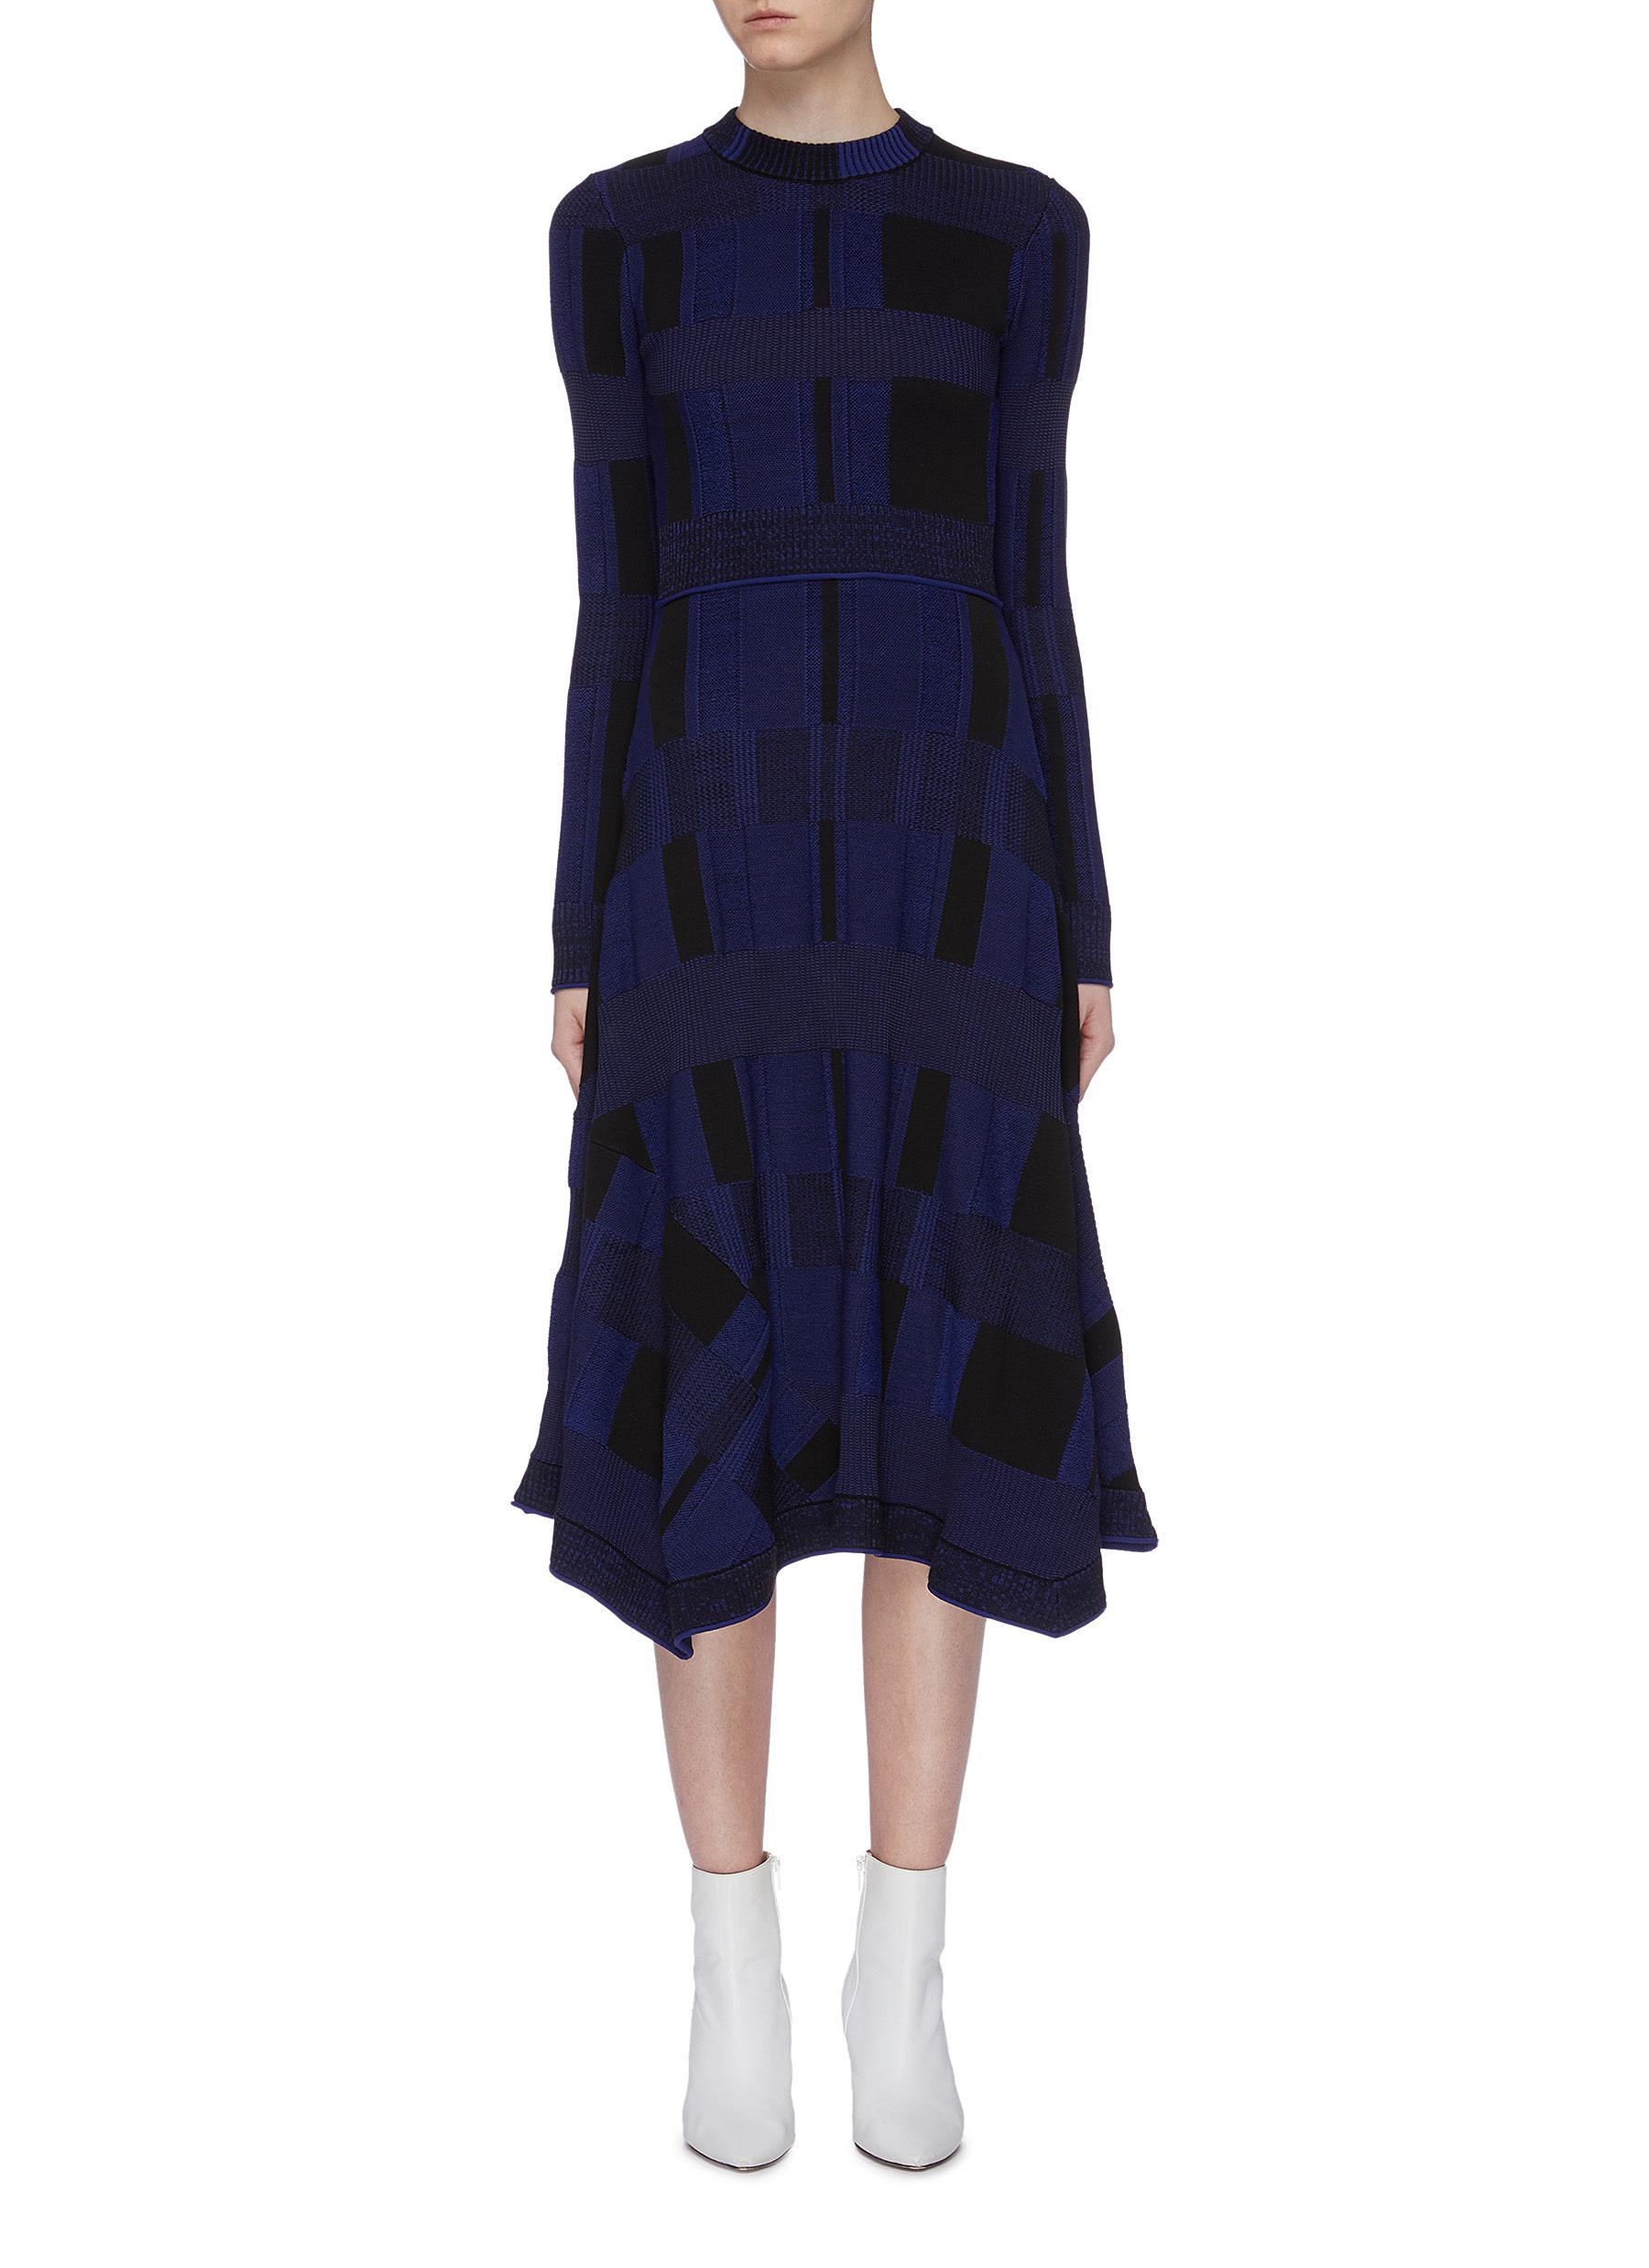 Geometric jacquard flared knit midi dress by Proenza Schouler